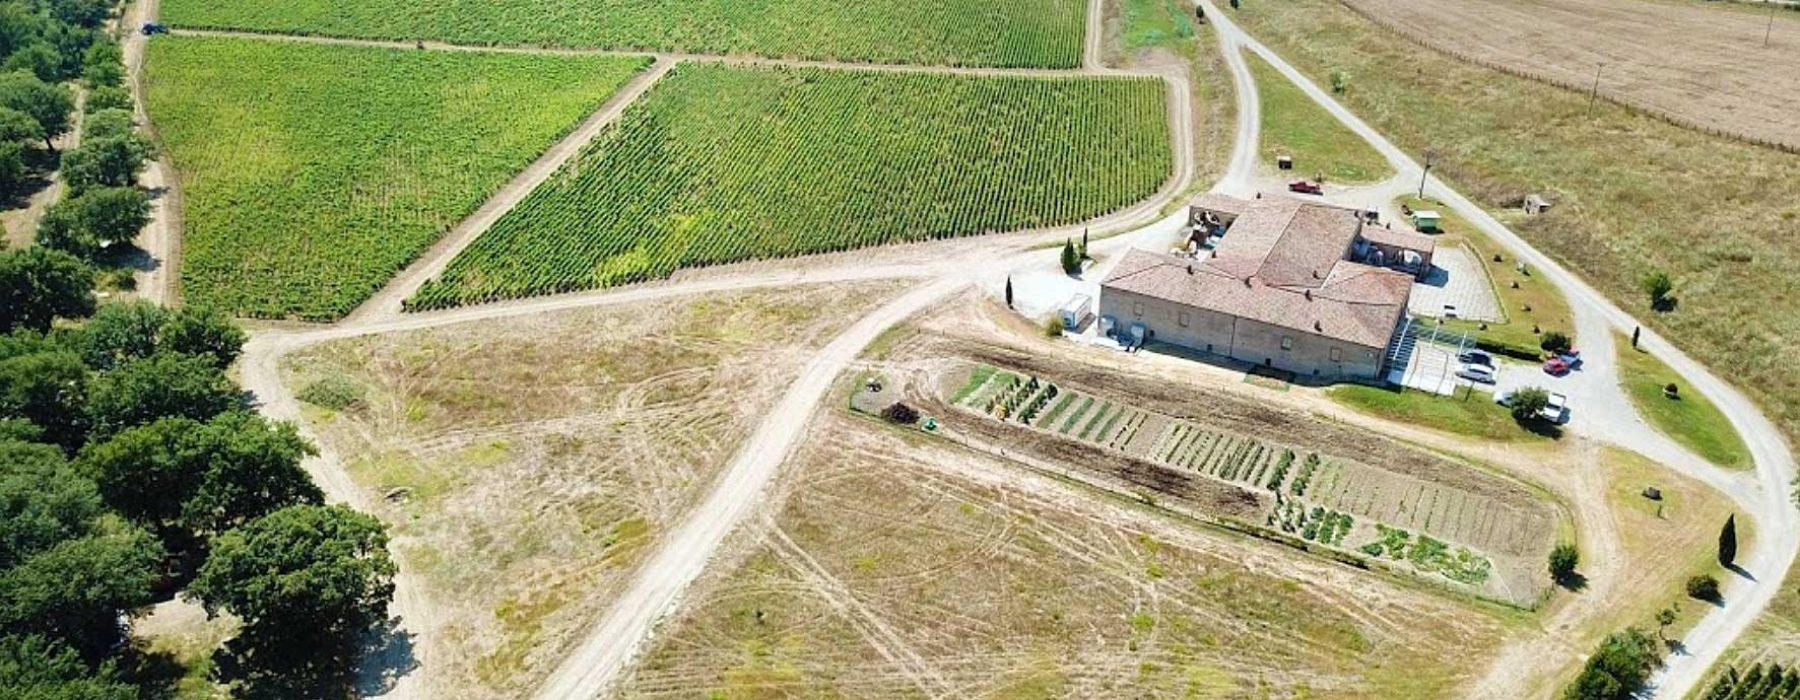 Trinoro e Passopisciaro: من توسكانا إلى صقلية للنبيذ الناجح